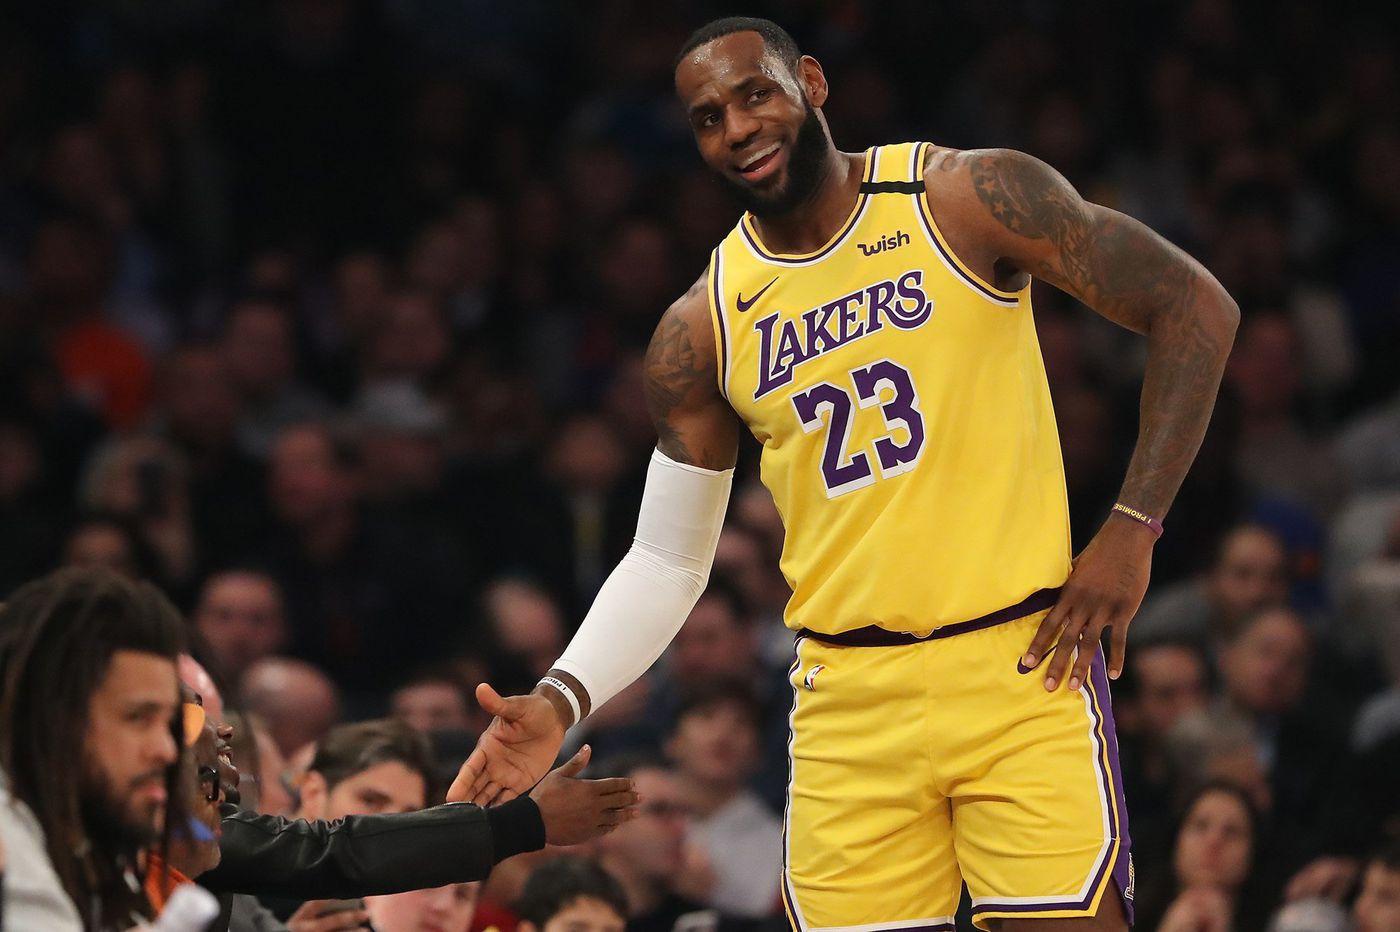 LeBron James enjoying full-time role as Los Angeles Lakers ...Lebron James Knicks Uniform